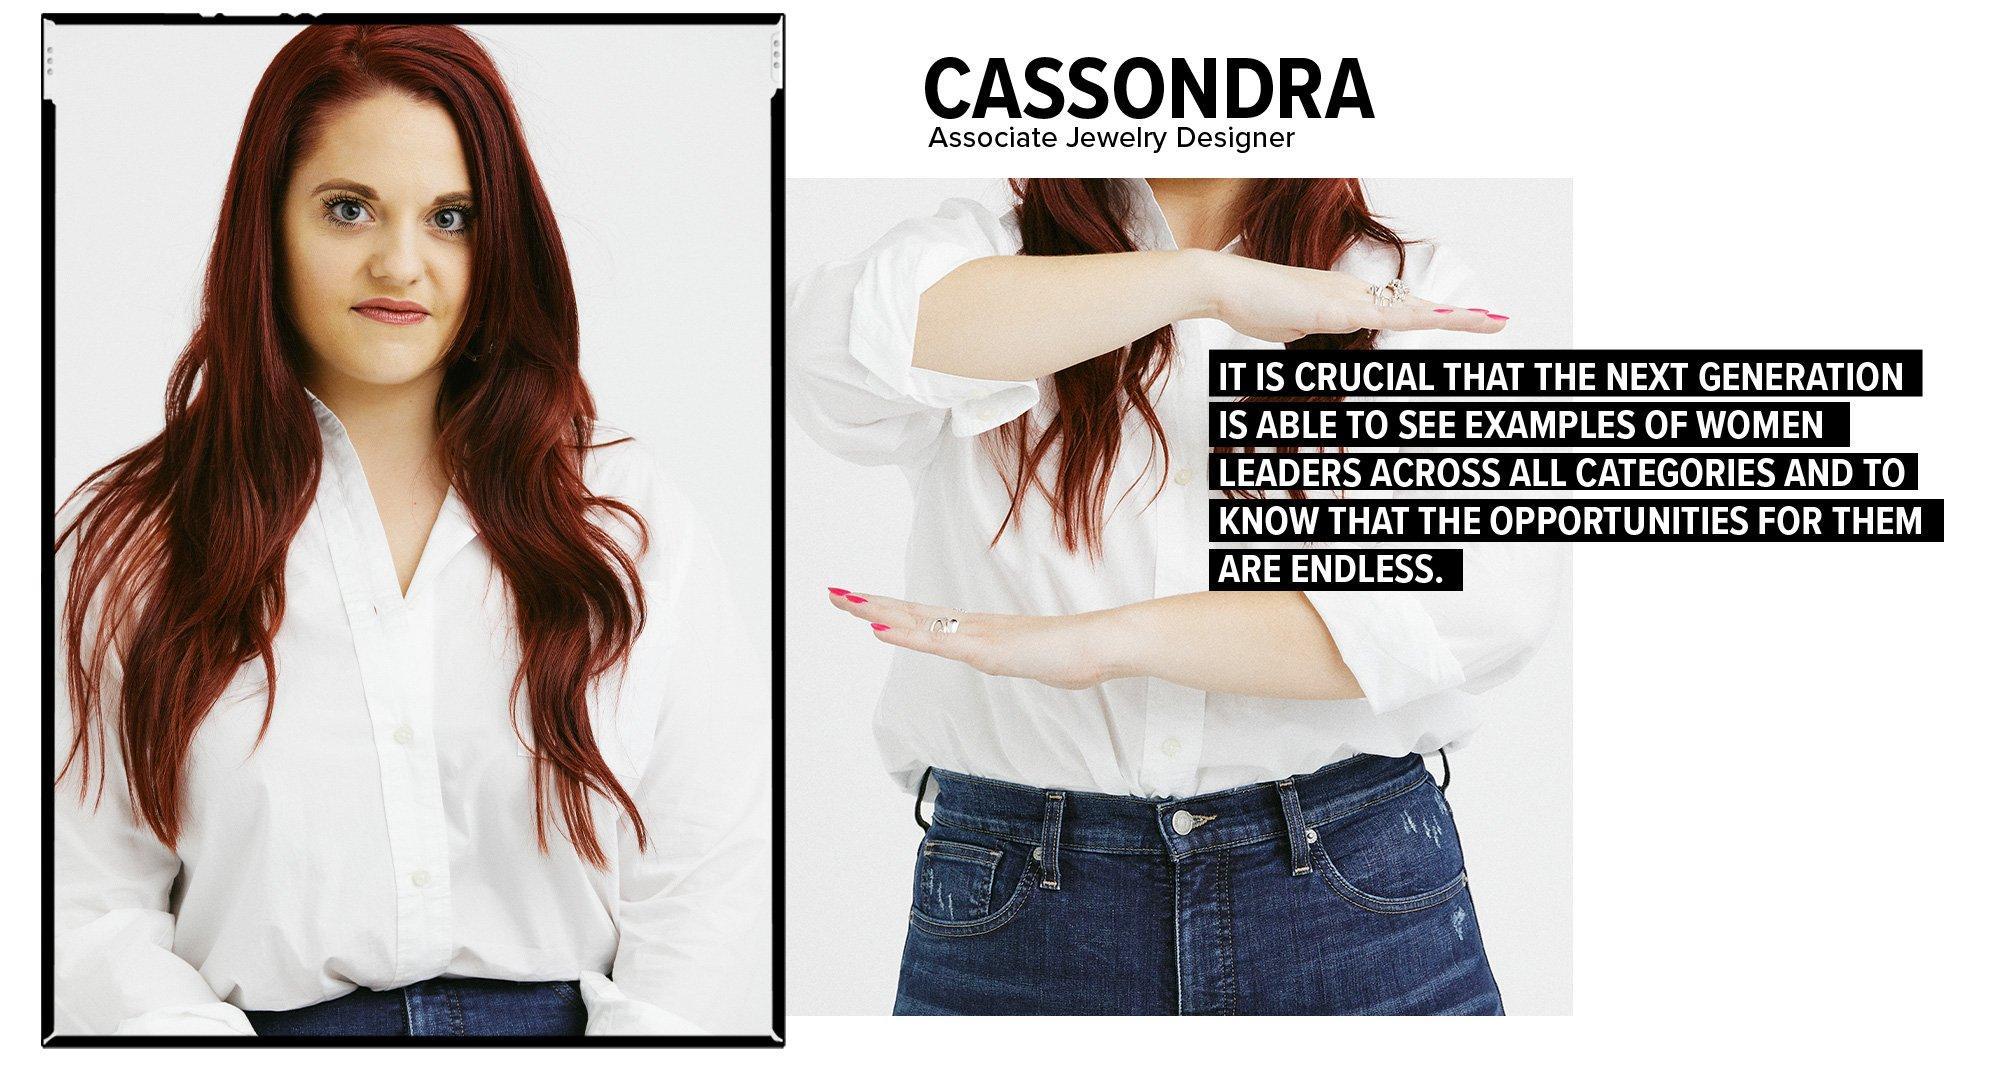 Cassondra - Associate Jewlery Designer